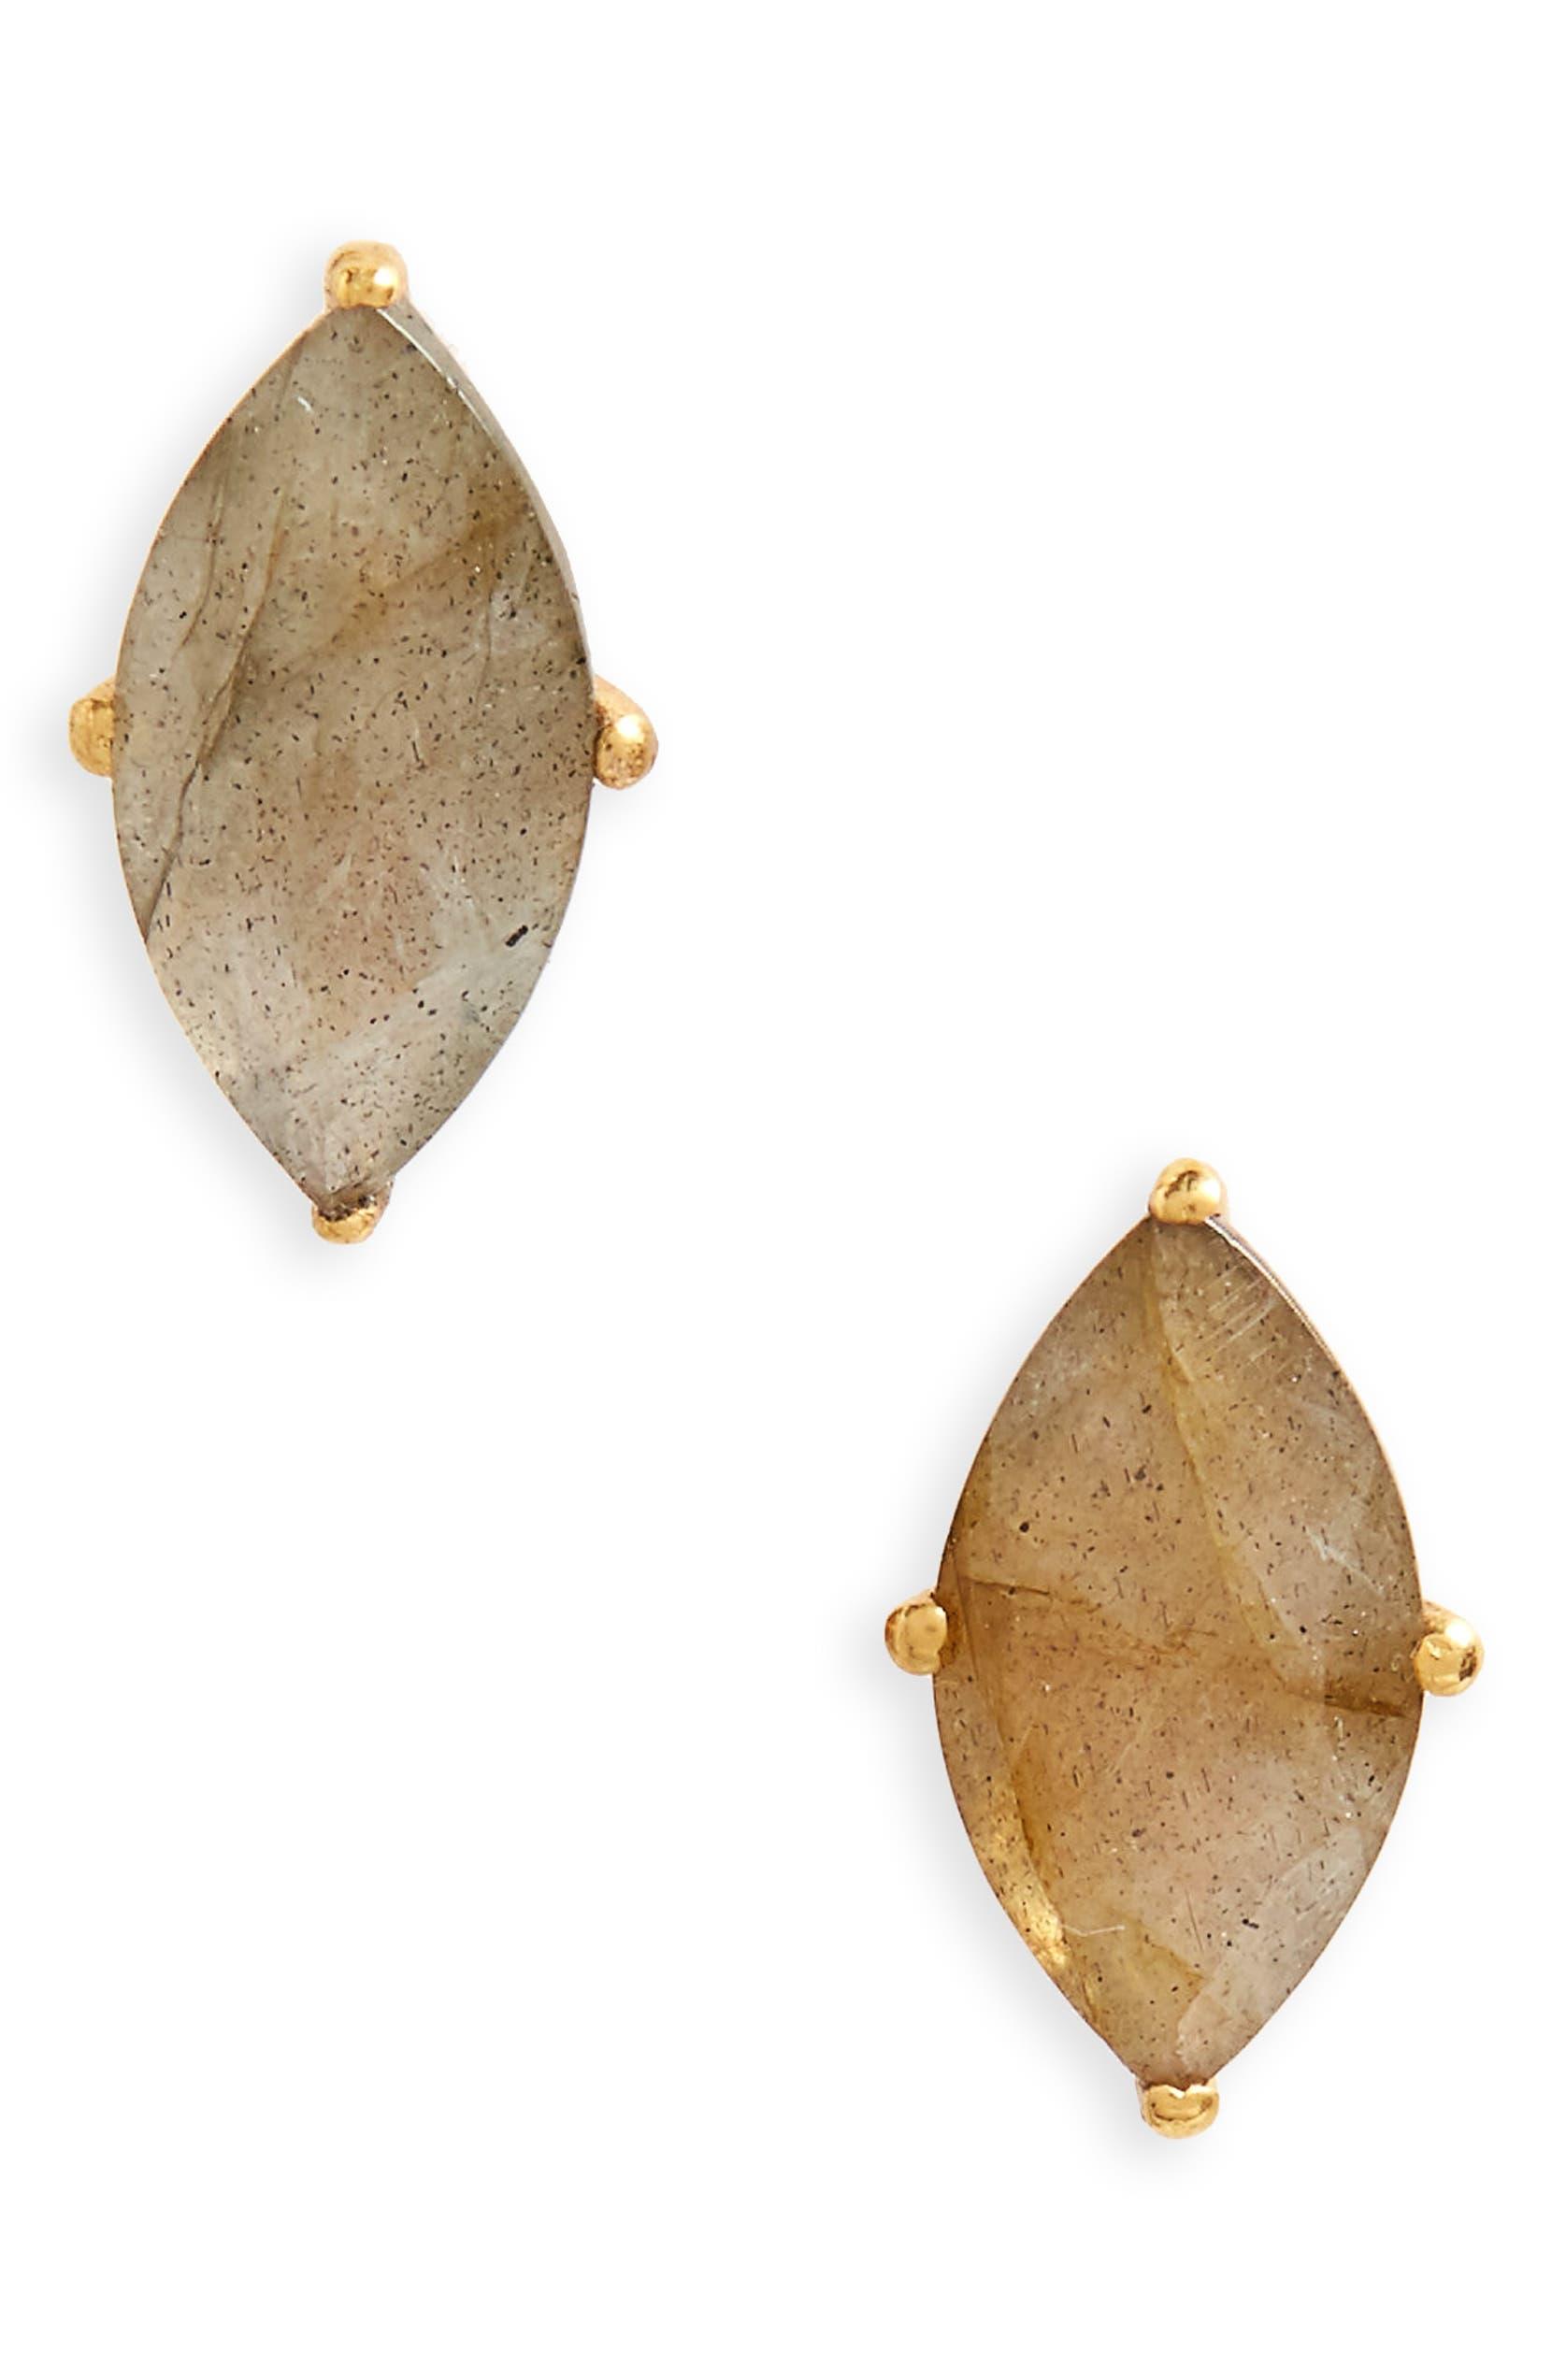 765e1f5db Dean Davidson Lotus Stud Earrings | Nordstrom